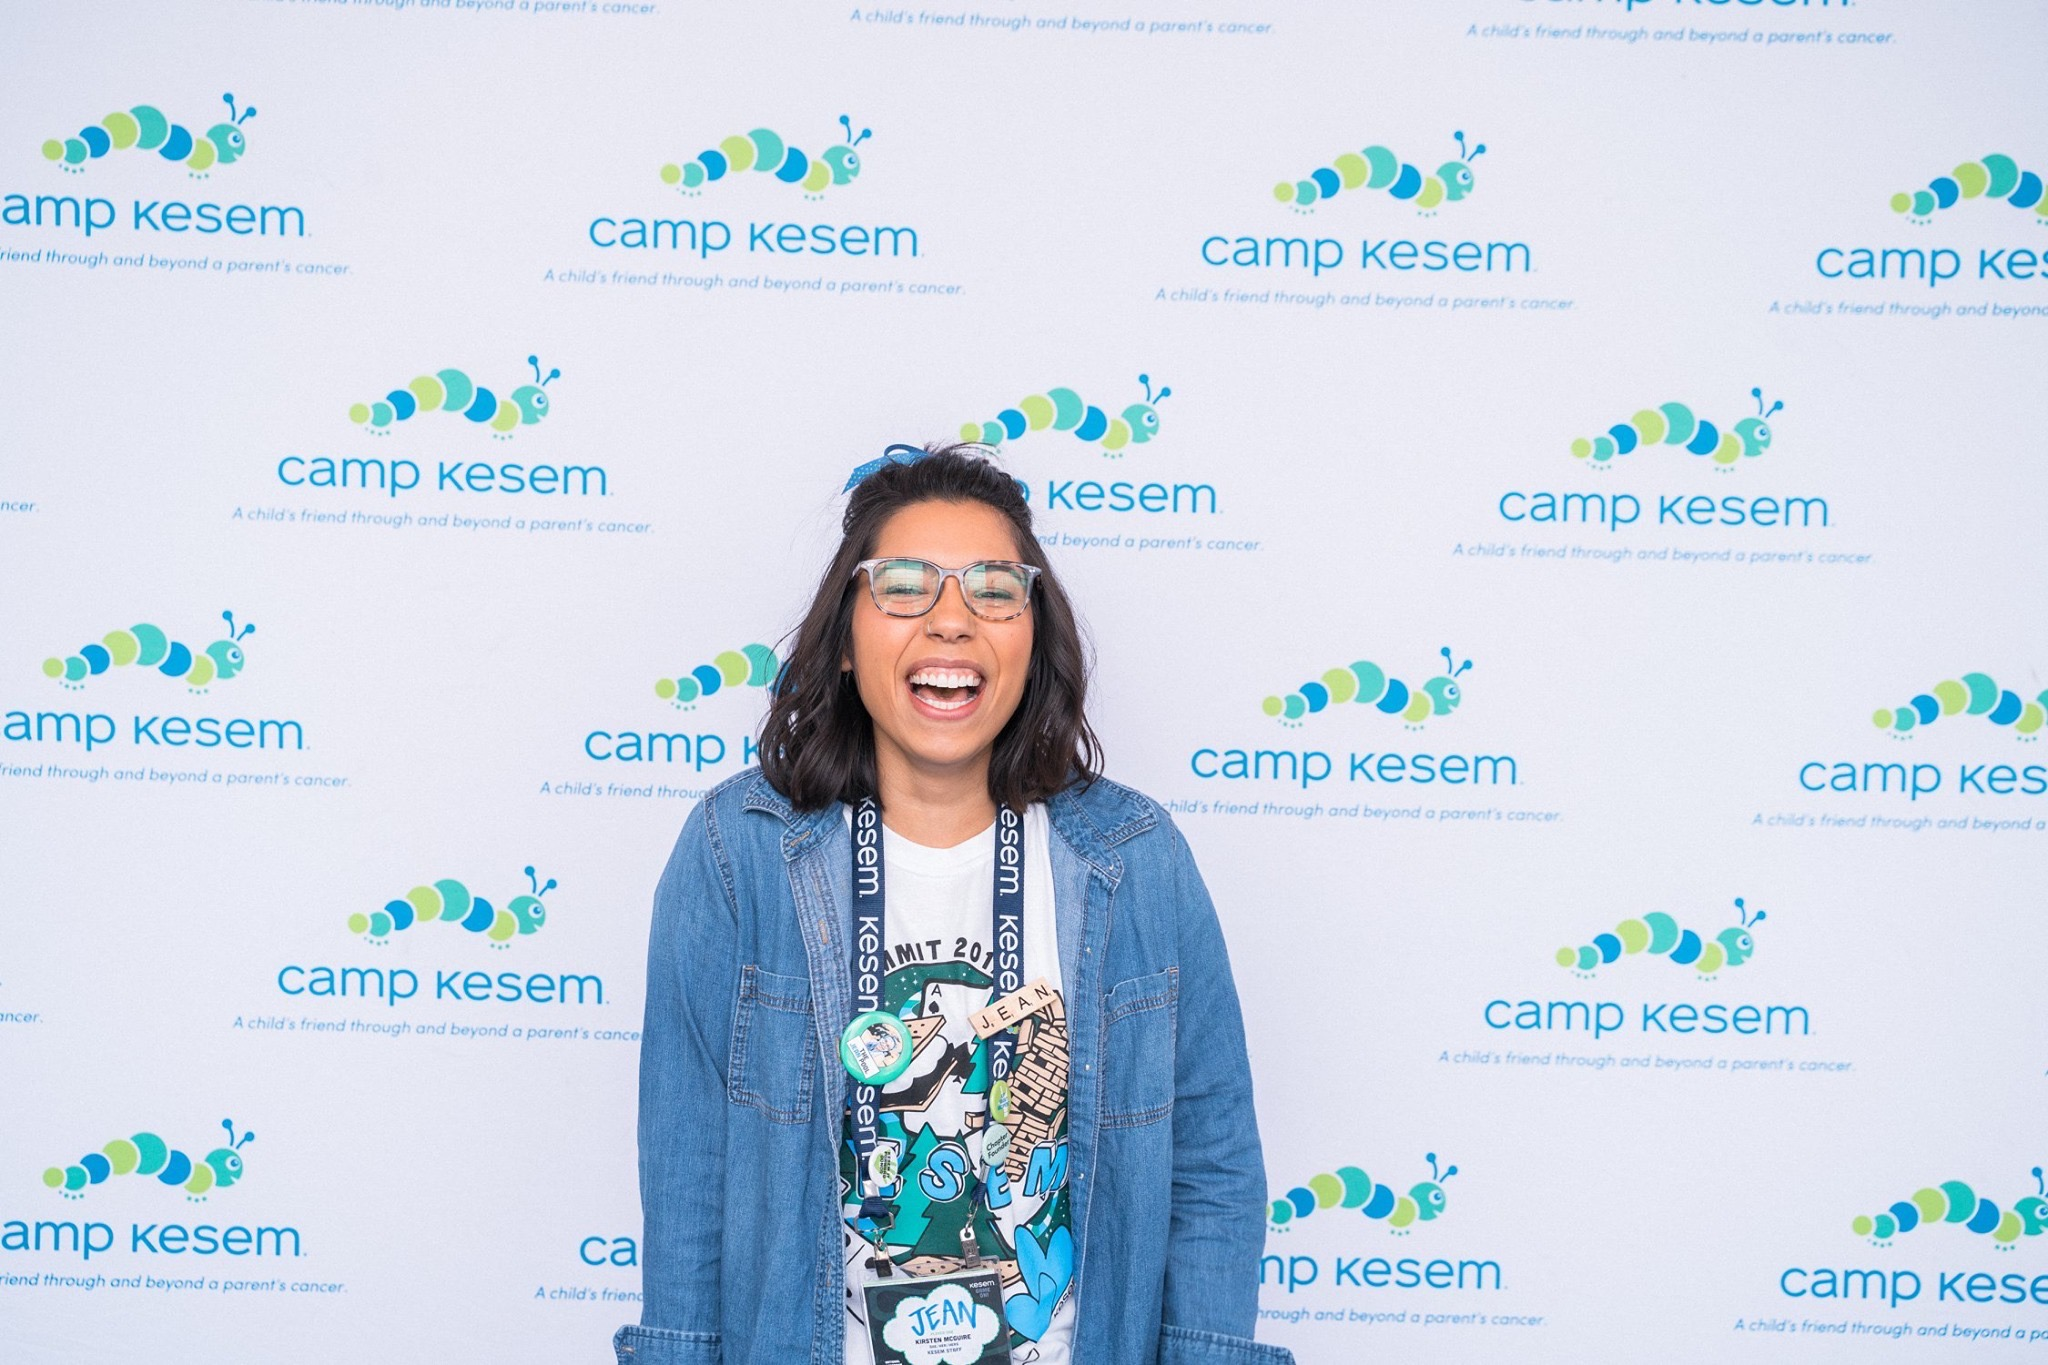 Kristen McGuire, Senior Program Director